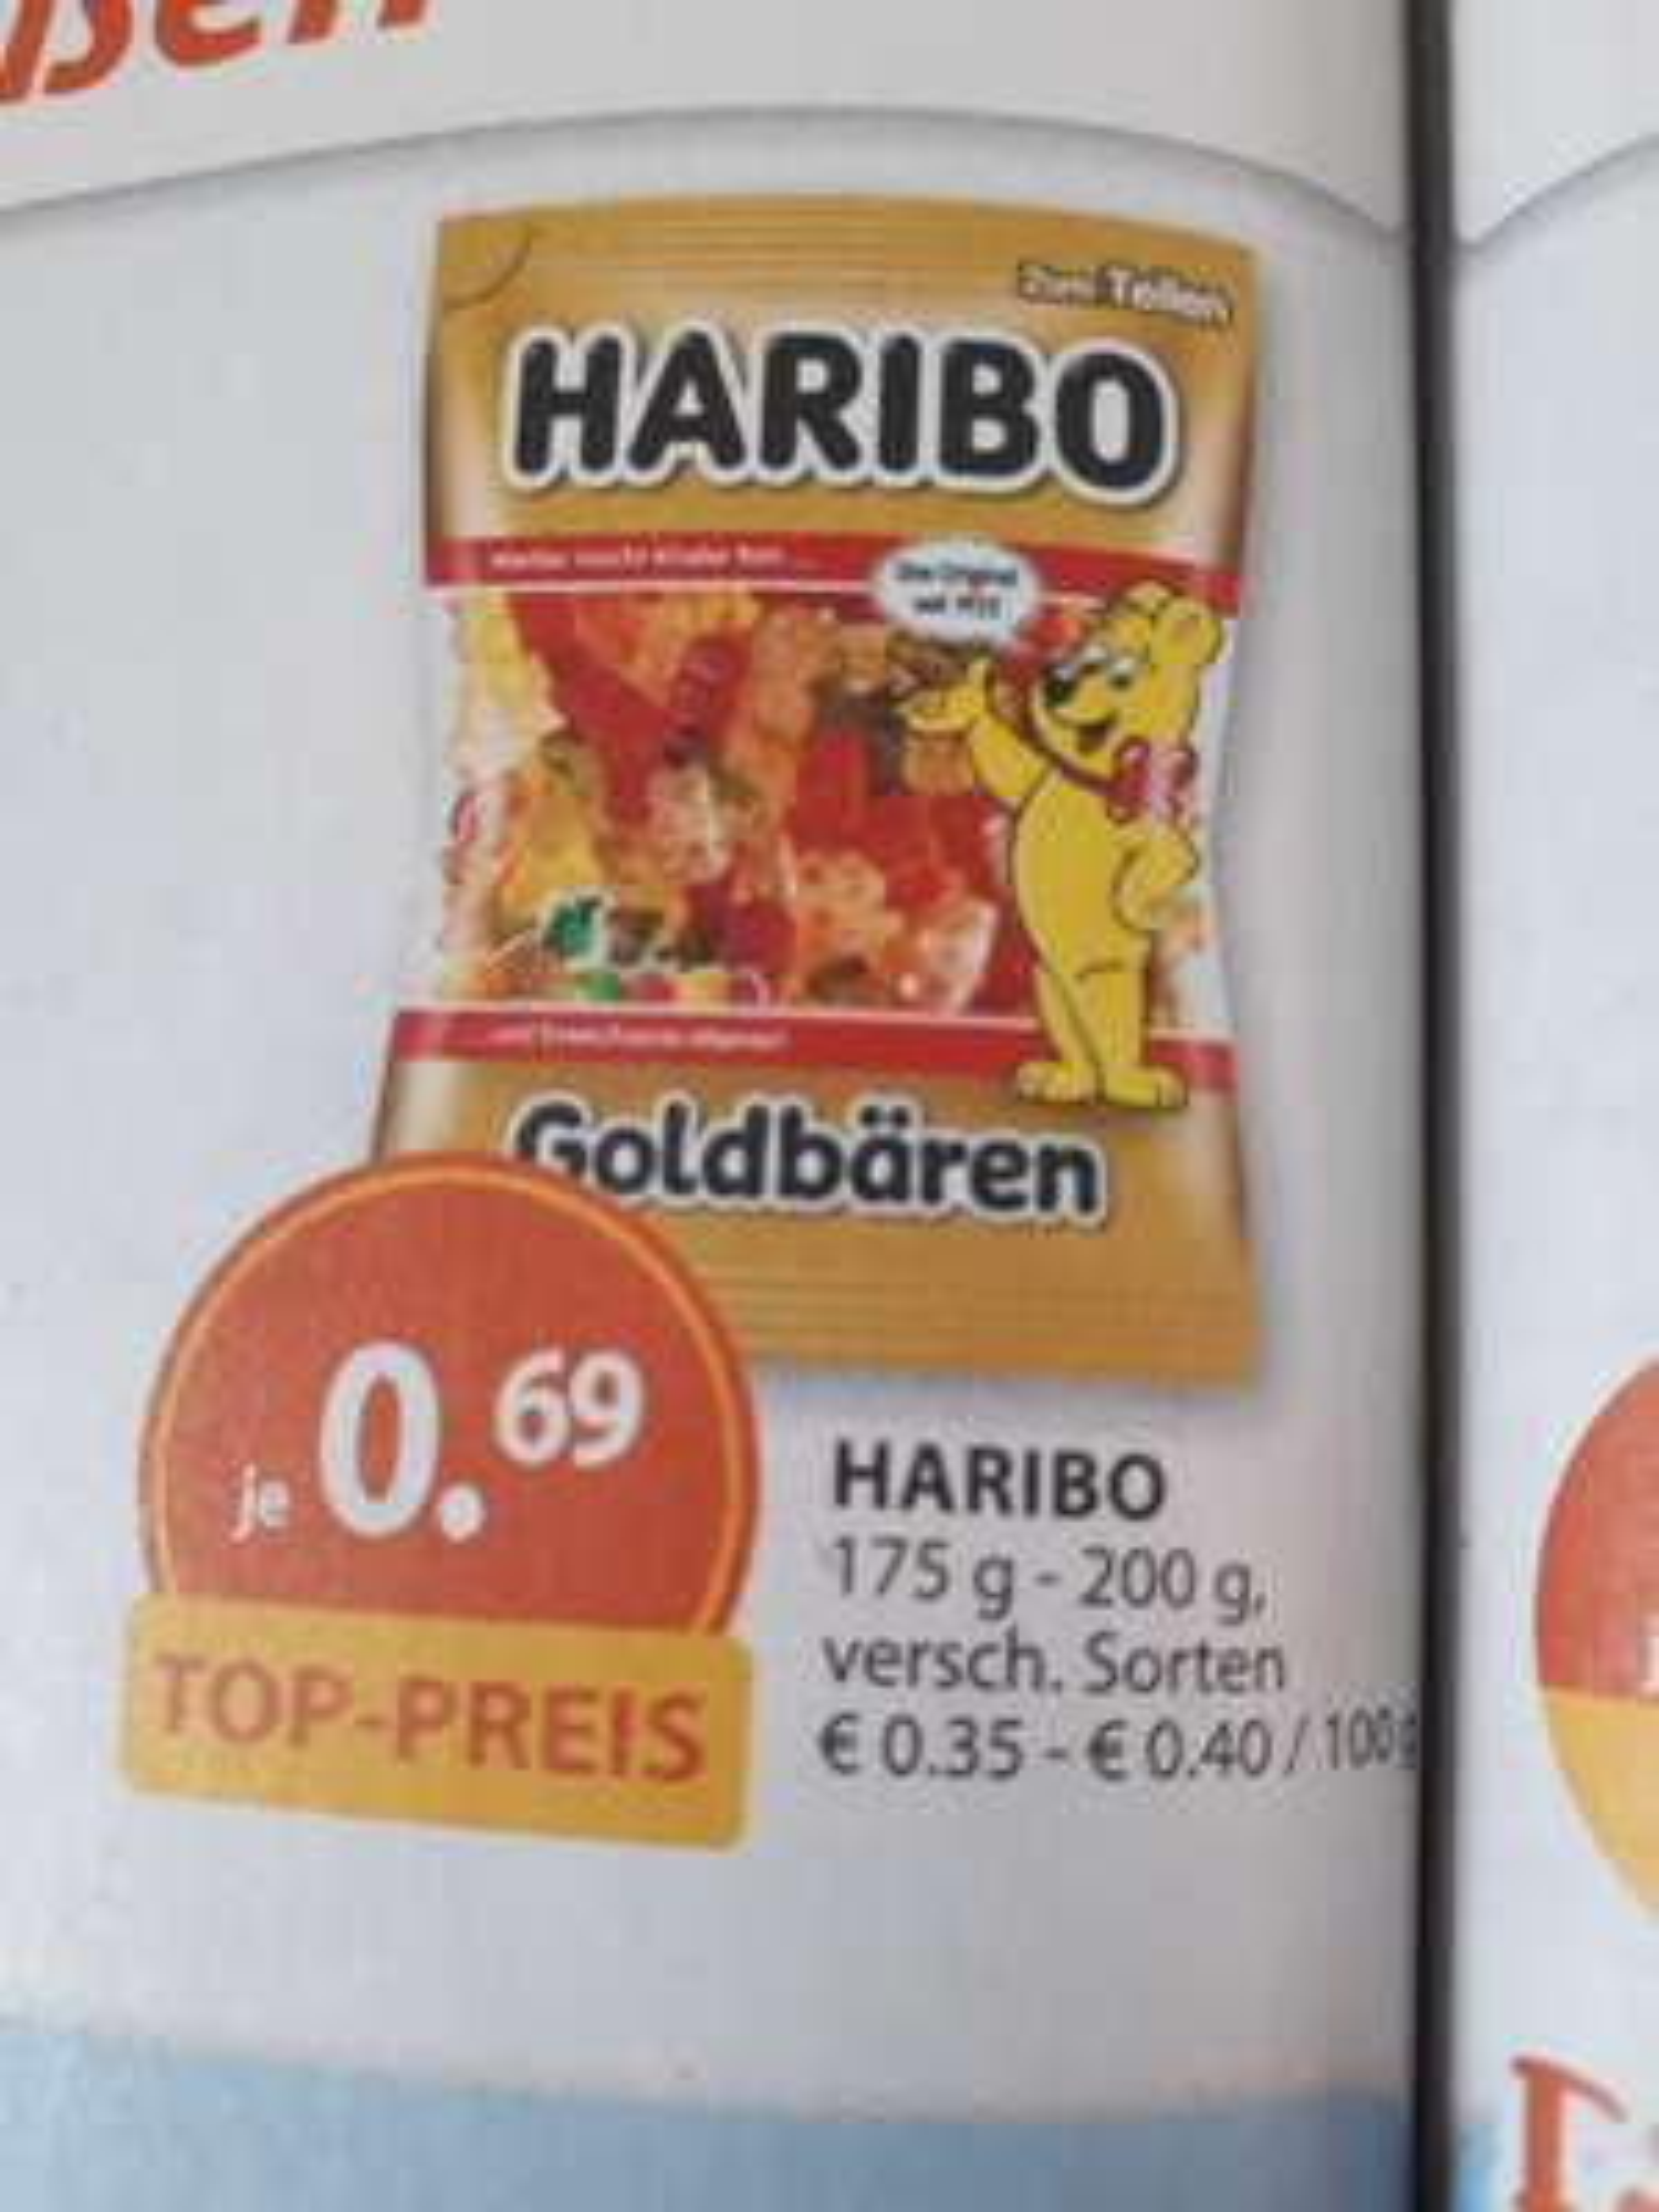 Haribo 200g bei Müller